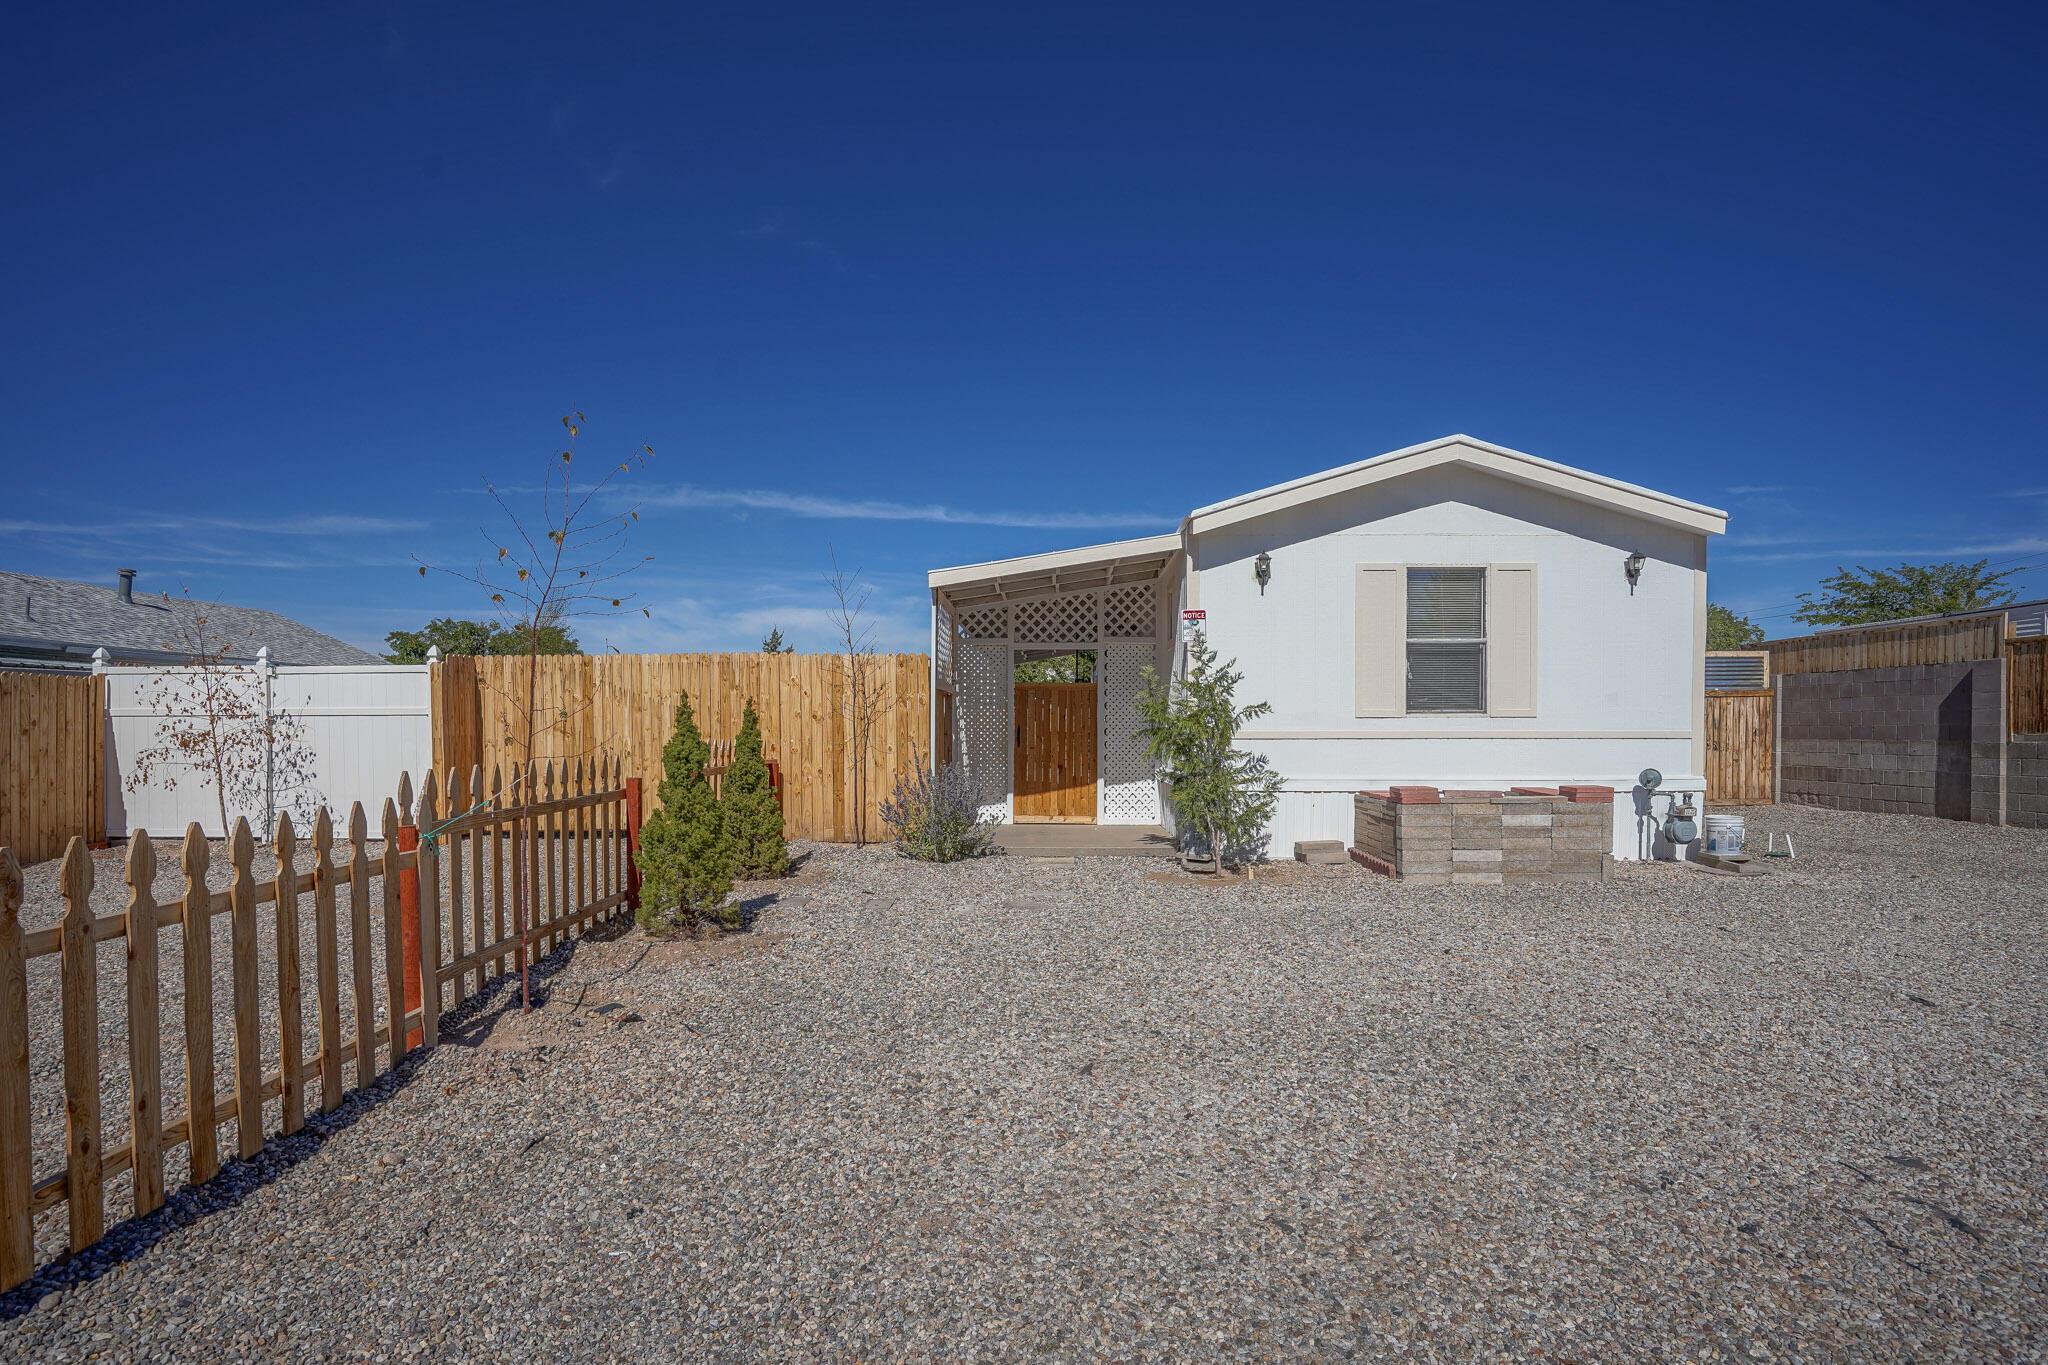 6925 DERICKSON Avenue, Albuquerque NM 87109